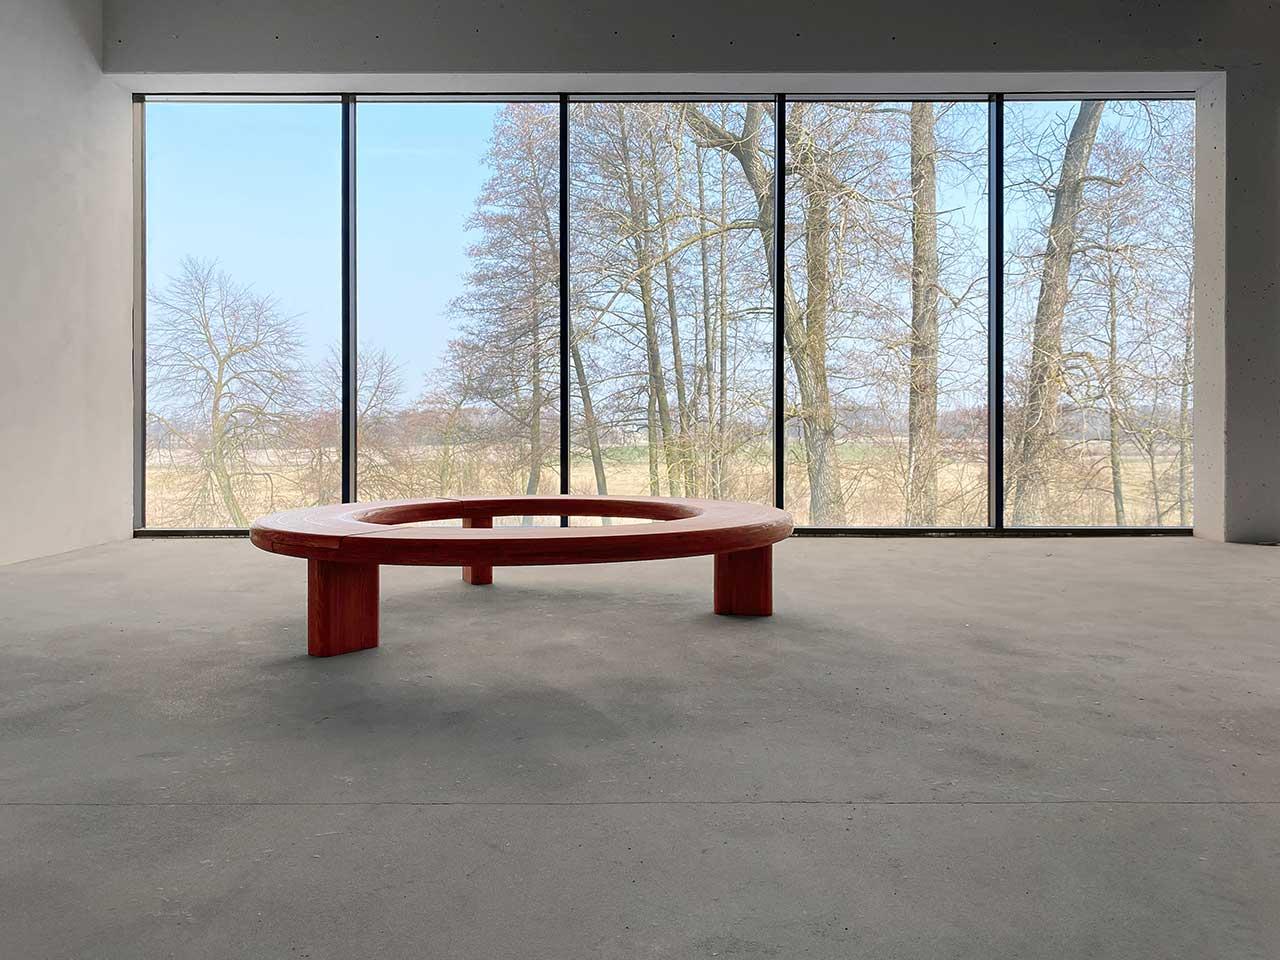 Tomek Rygalik Shares the Circula Bench Designed for Social Interaction